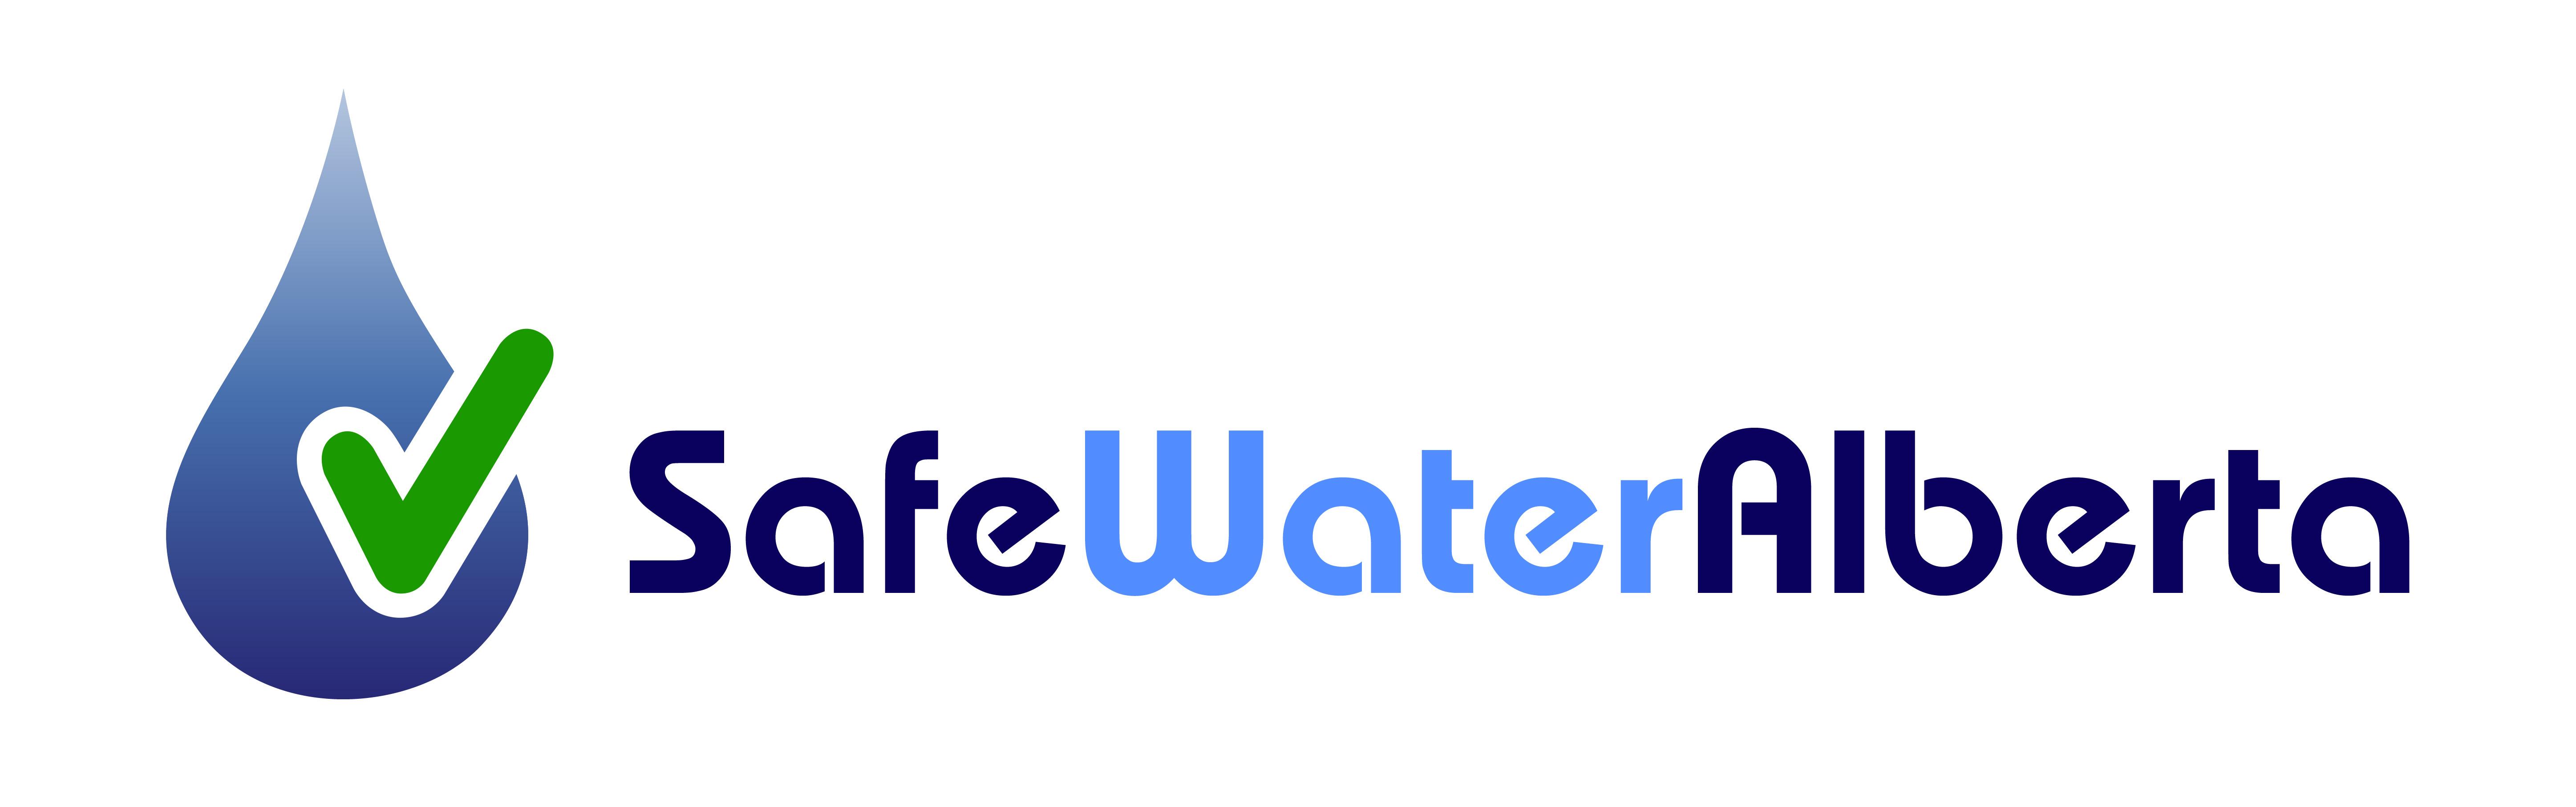 safe-water-alberta.jpg